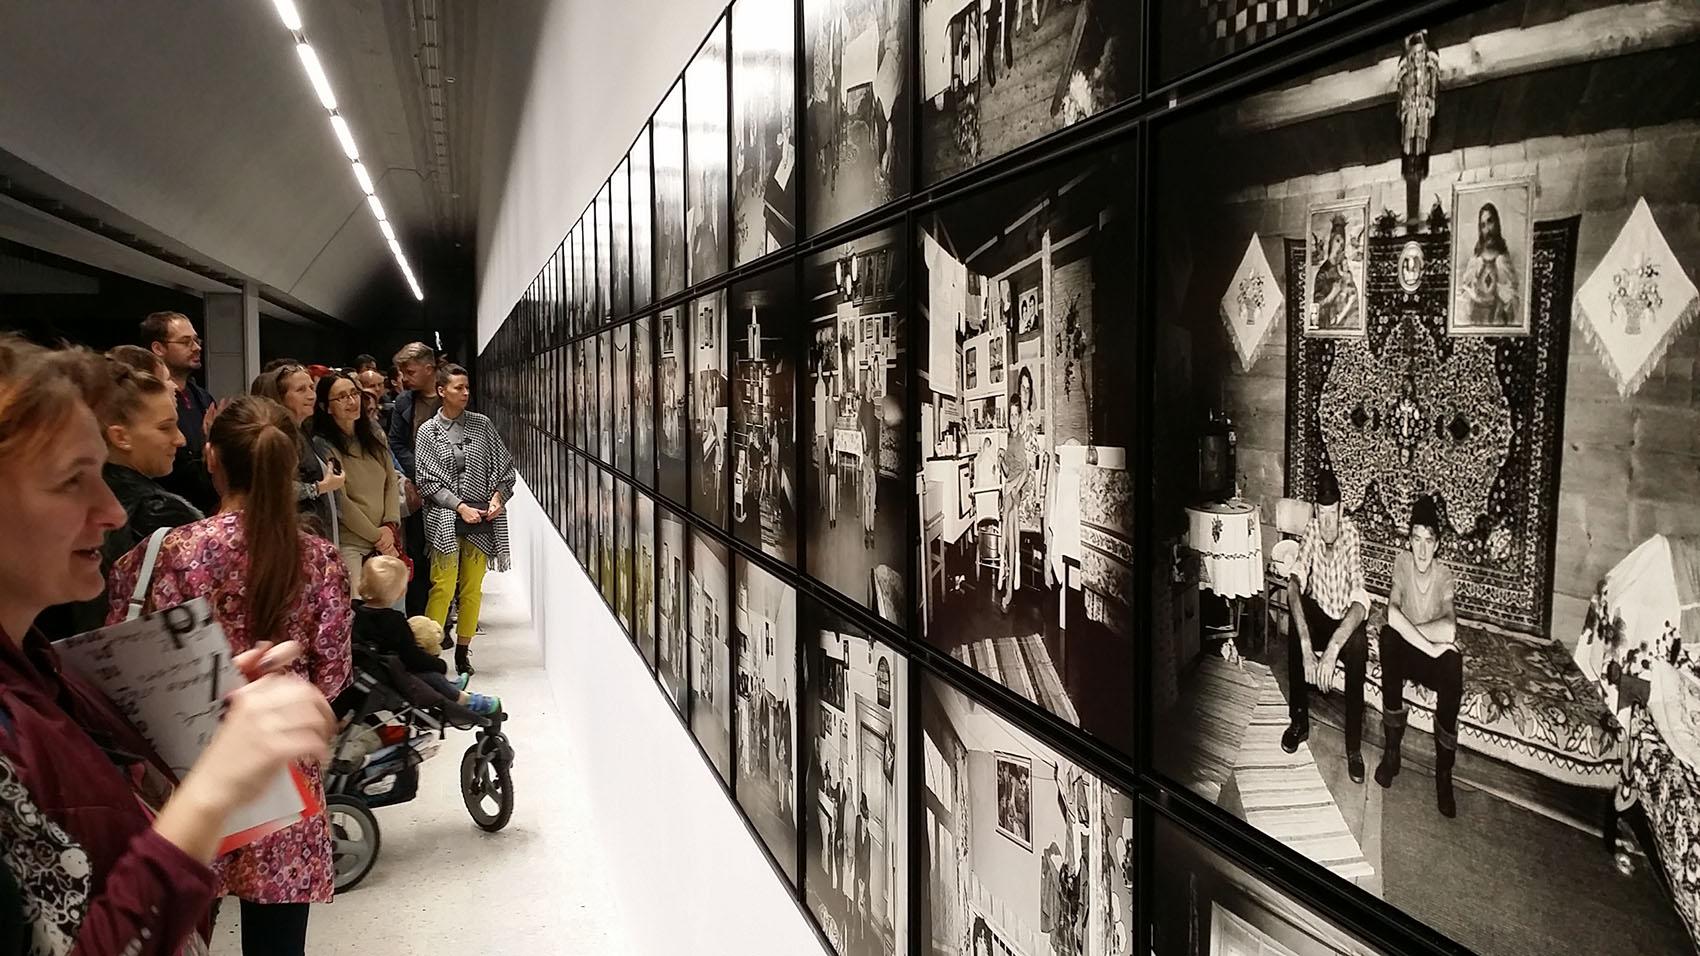 fotoblog-foto-blog-zofia-rydet-wystawa-zapis-socjologiczny-5